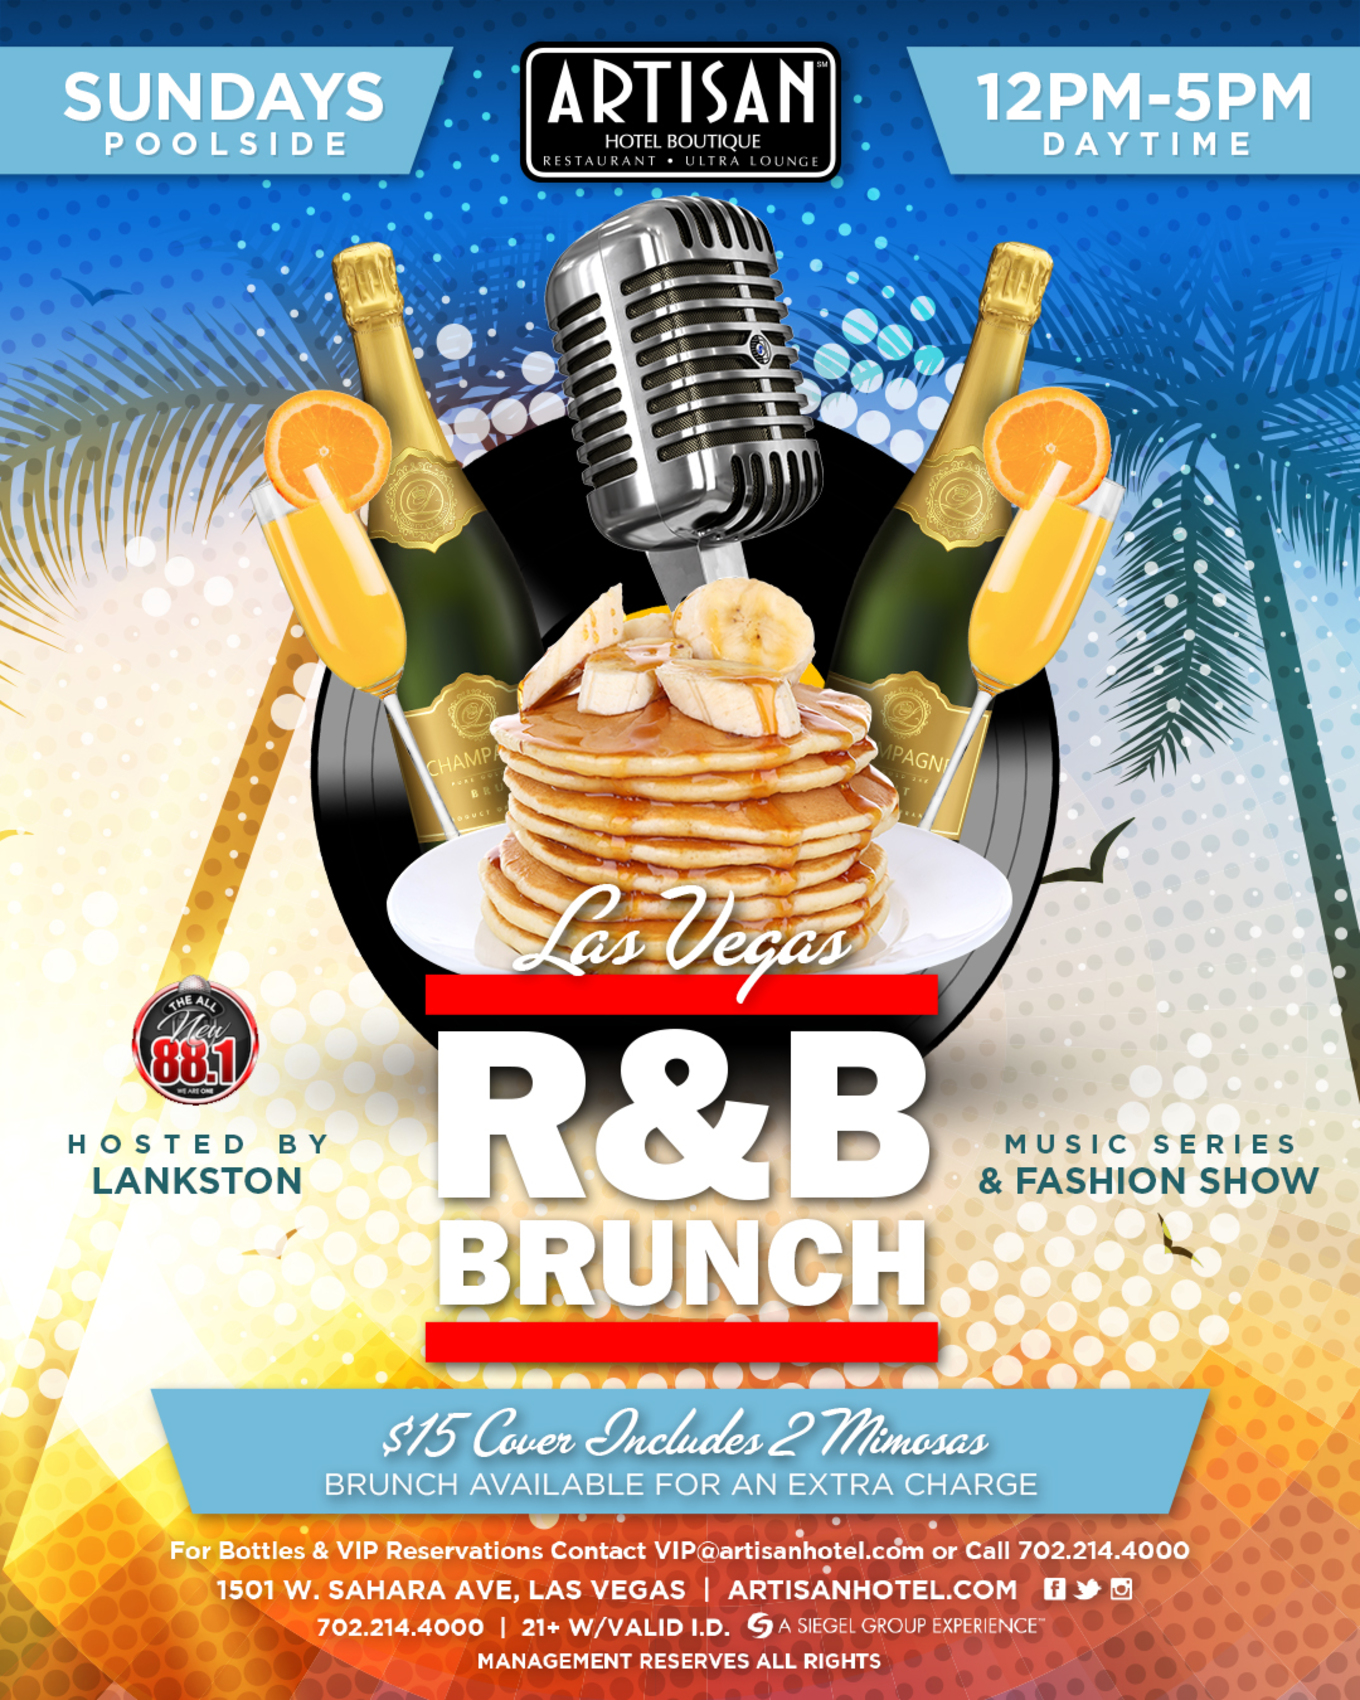 Las Vegas R&B Brunch - Tickets - Artisan Hotel Boutique, Las Vegas